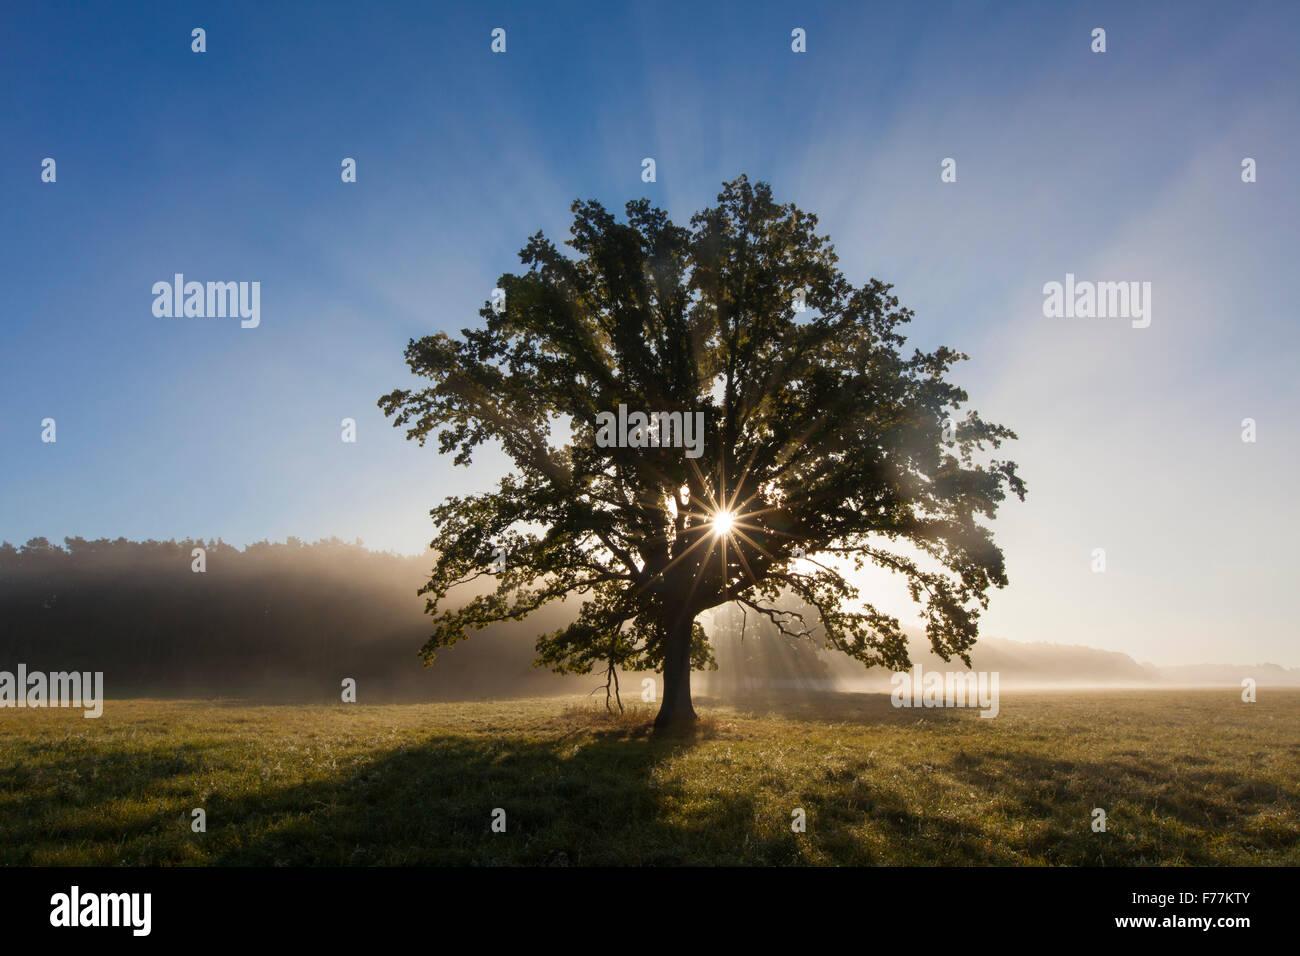 Sun shining through foliage of old solitary English oak / pedunculate oak / French oak tree (Quercus robur) in meadow - Stock Image